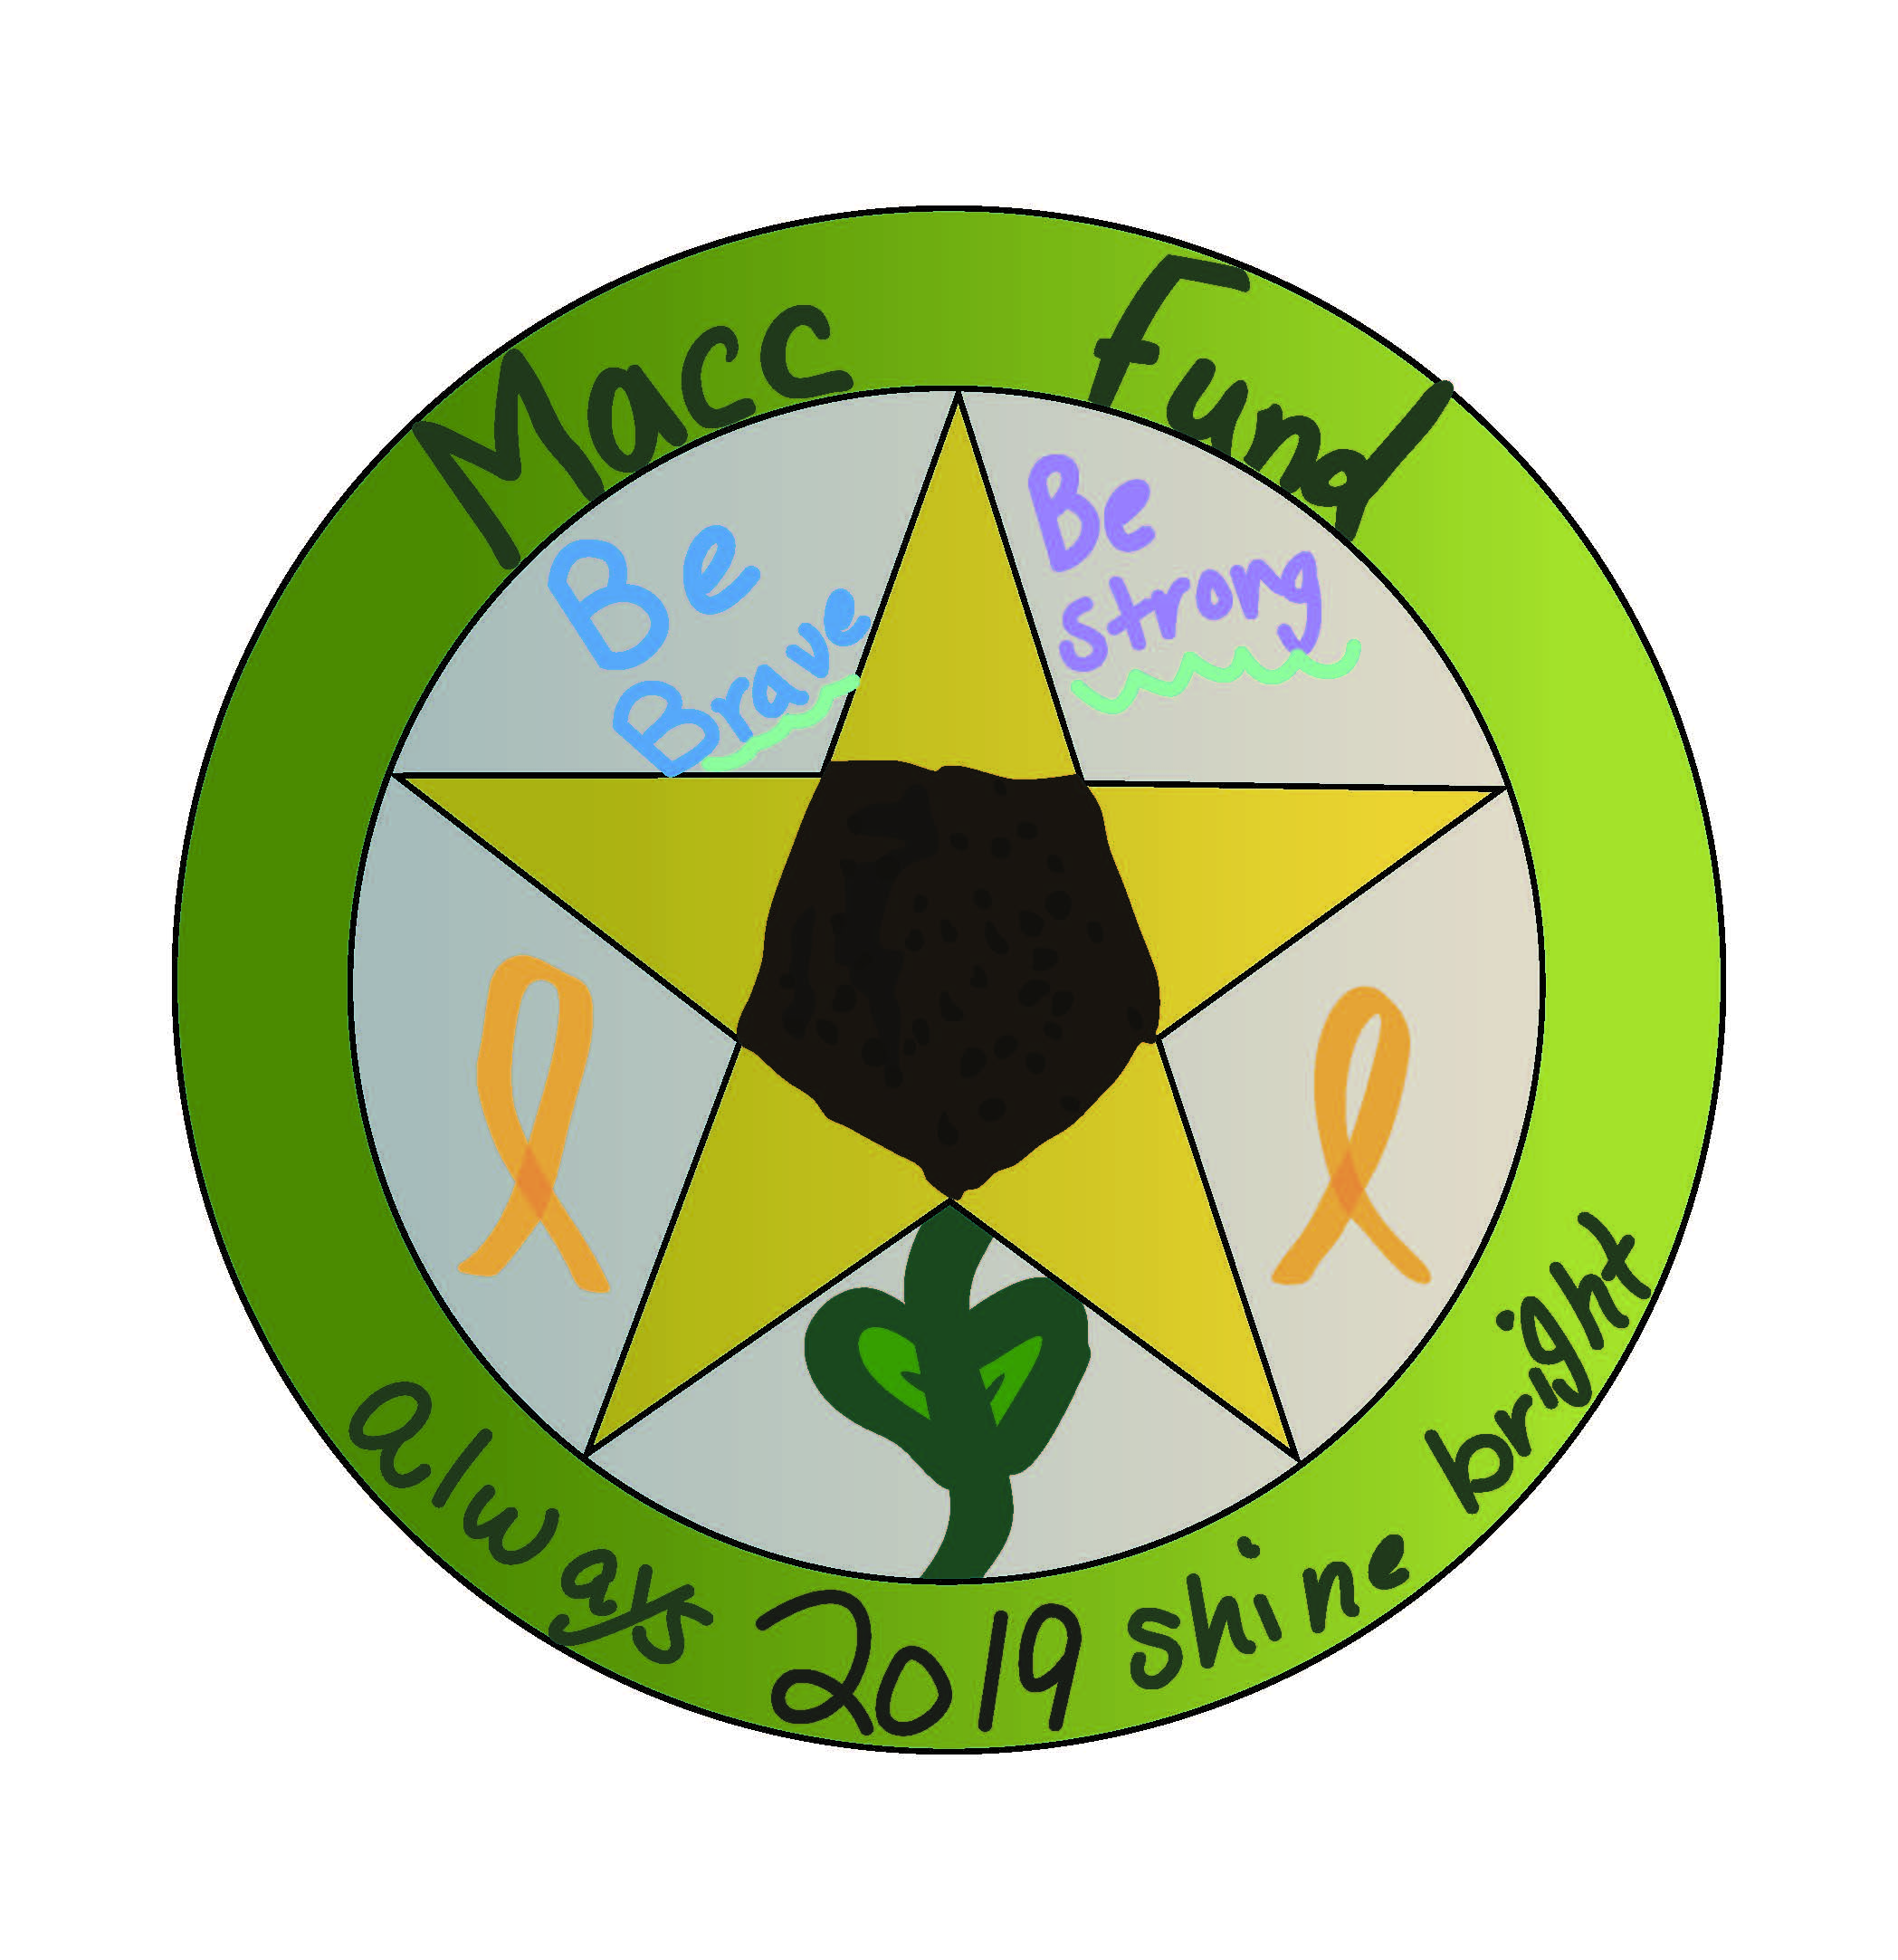 2019 MACC Star